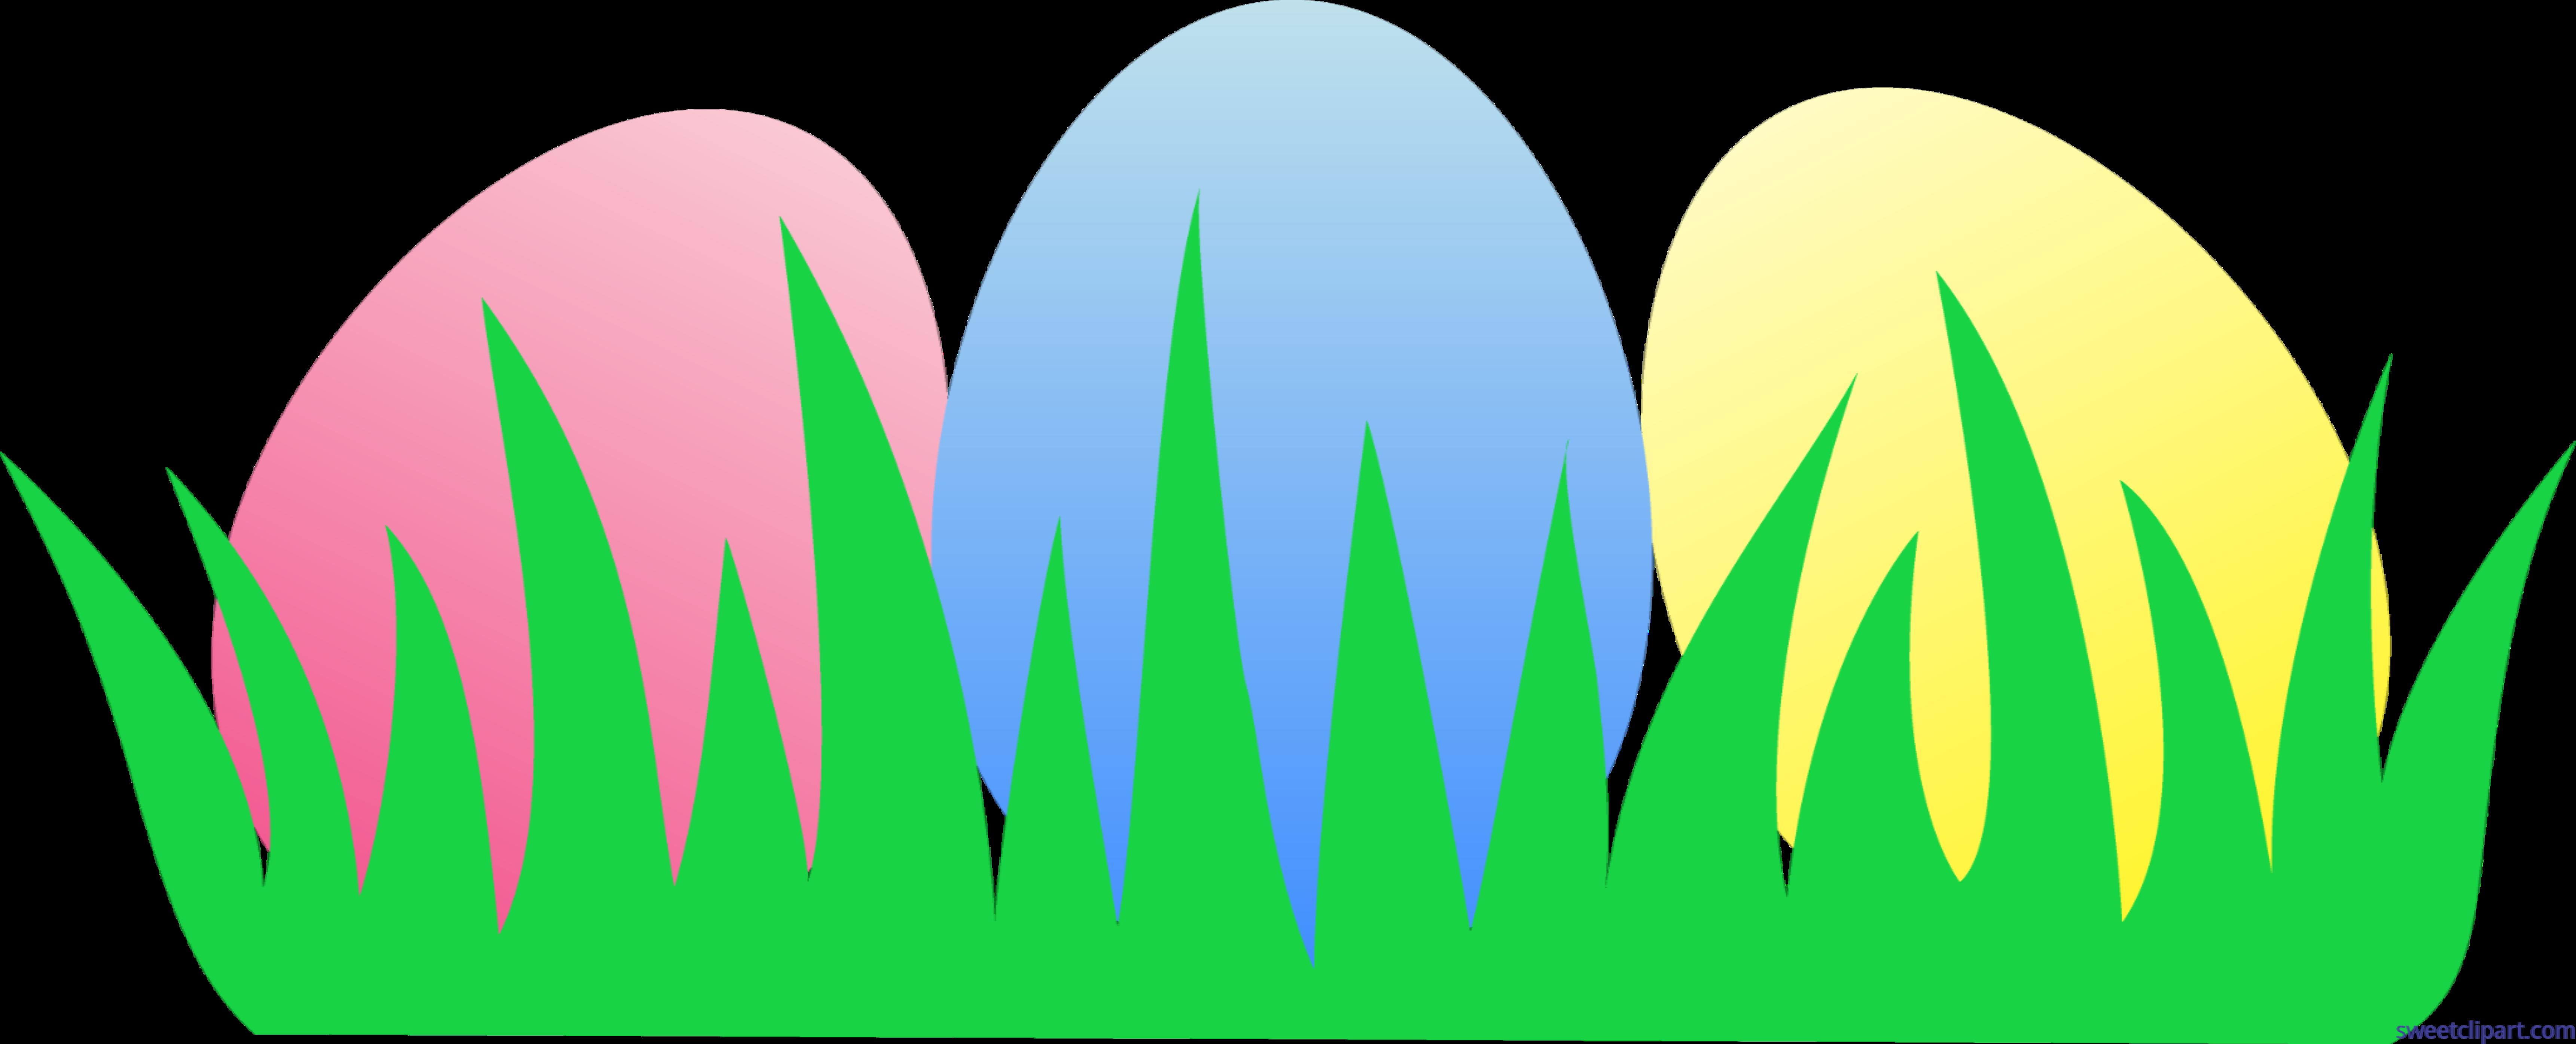 Clipart grass easter egg. Eggs clip art sweet